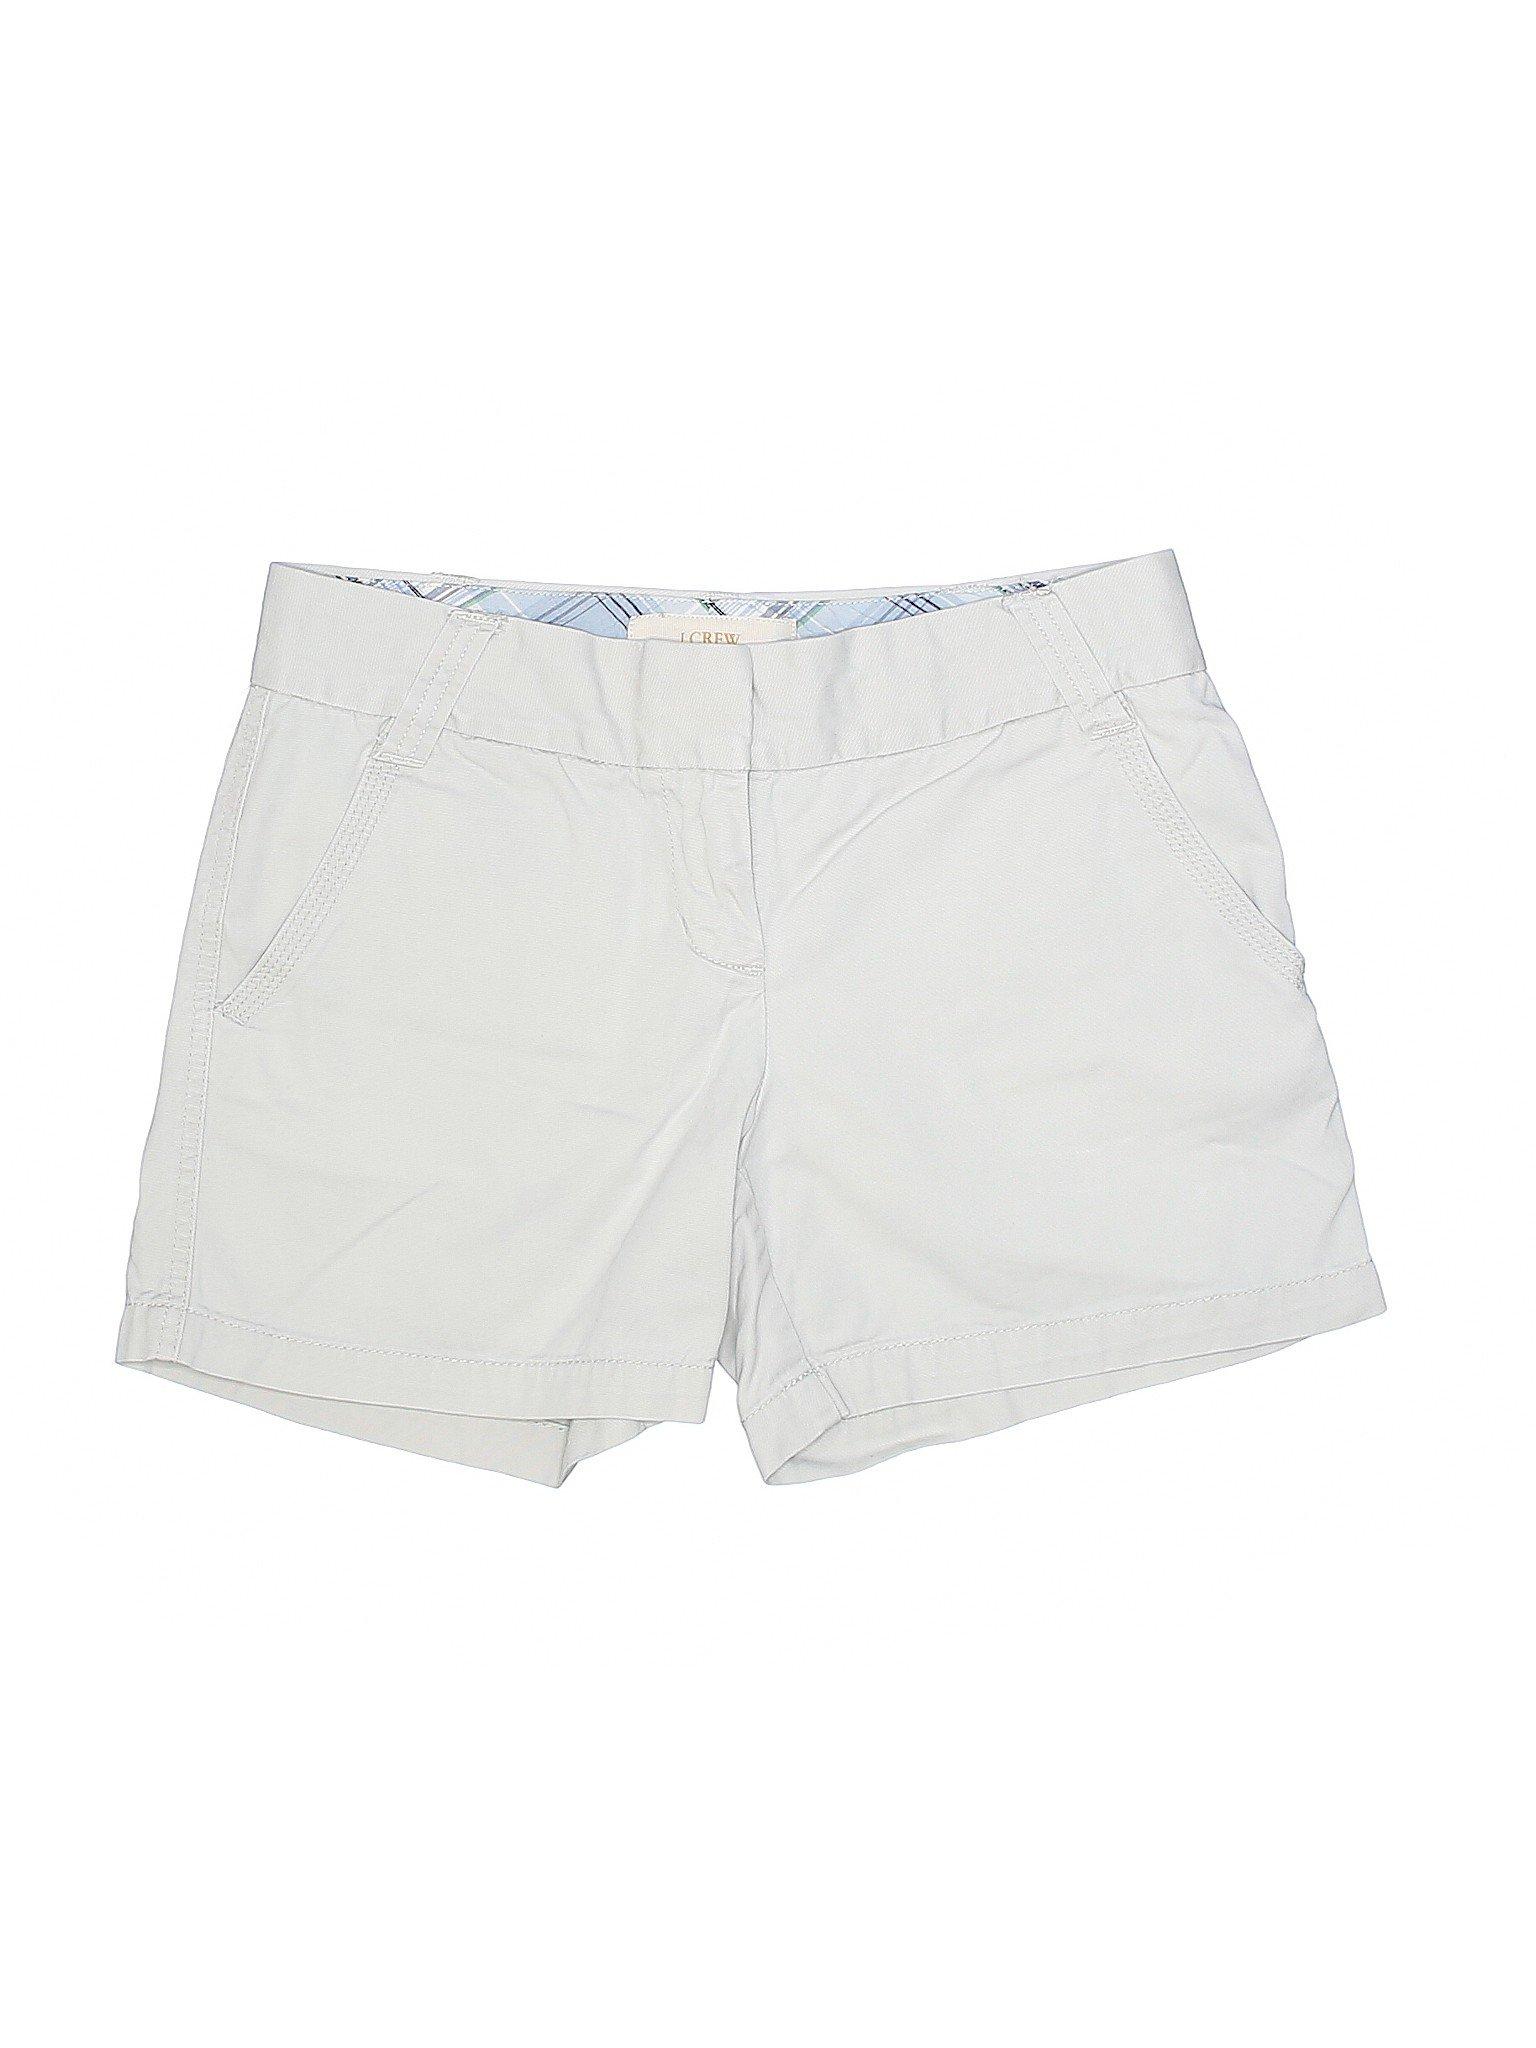 Crew Khaki Boutique Shorts J winter nvpgHWE